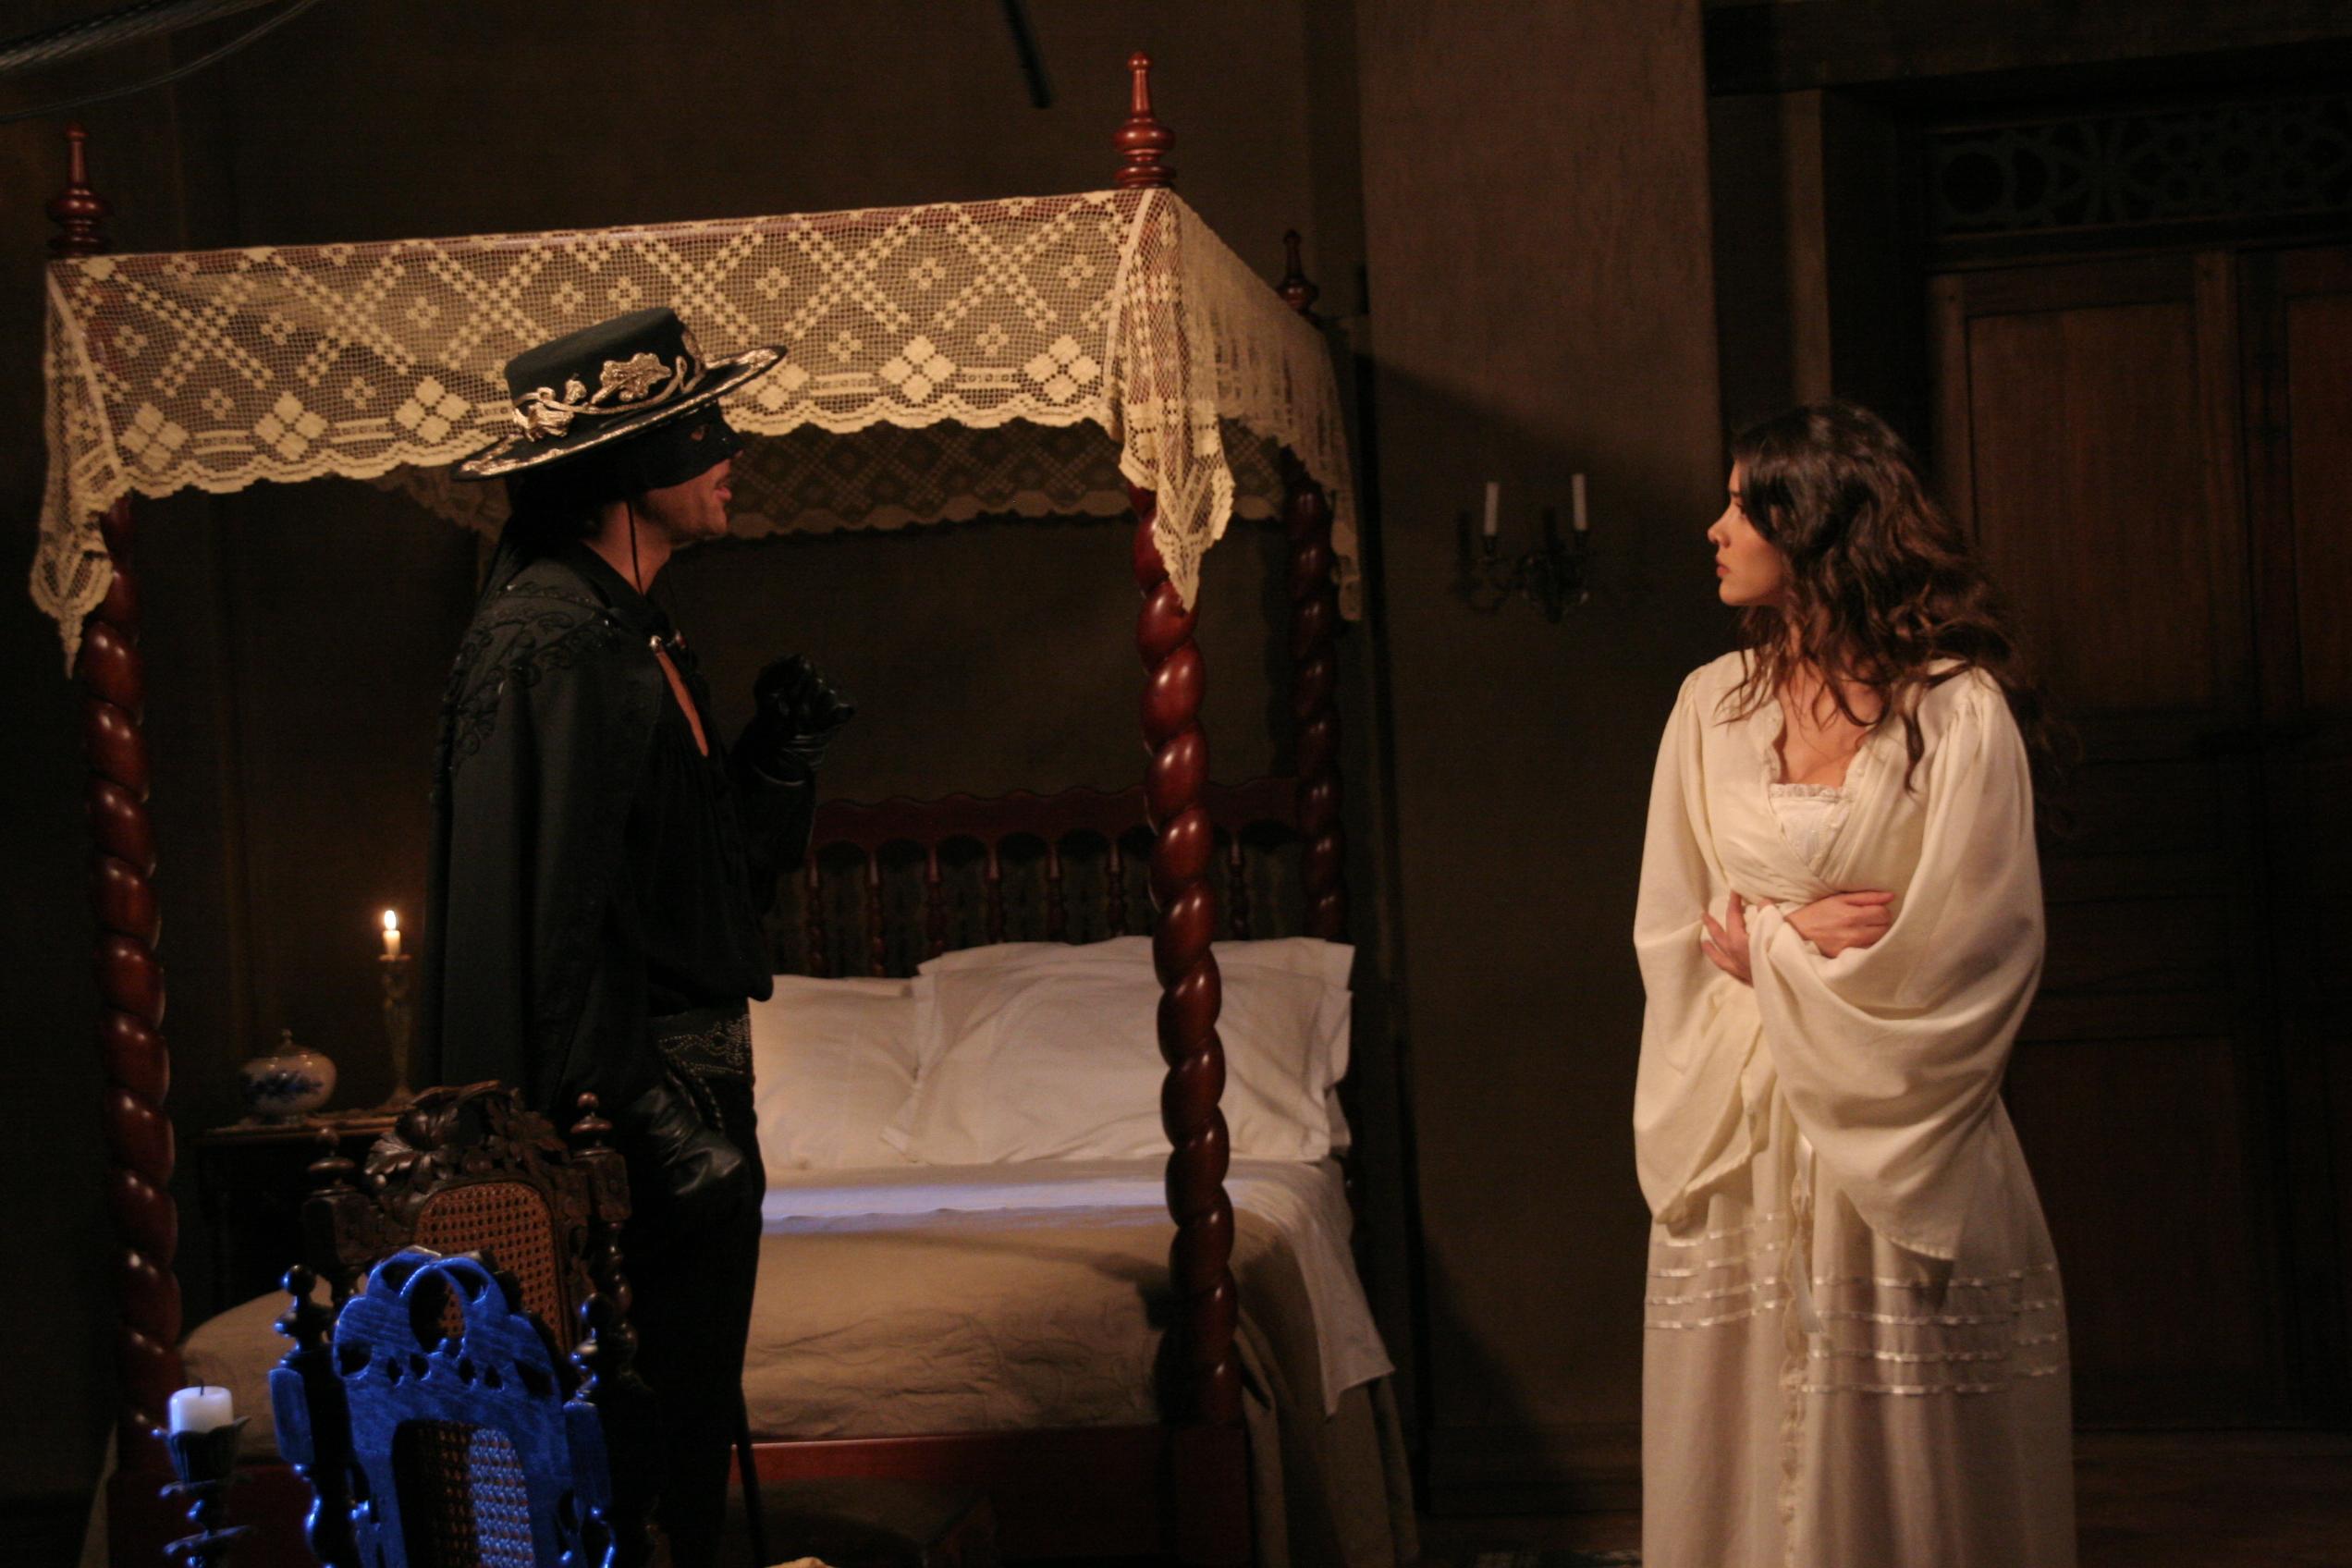 Zorro visita a su amada